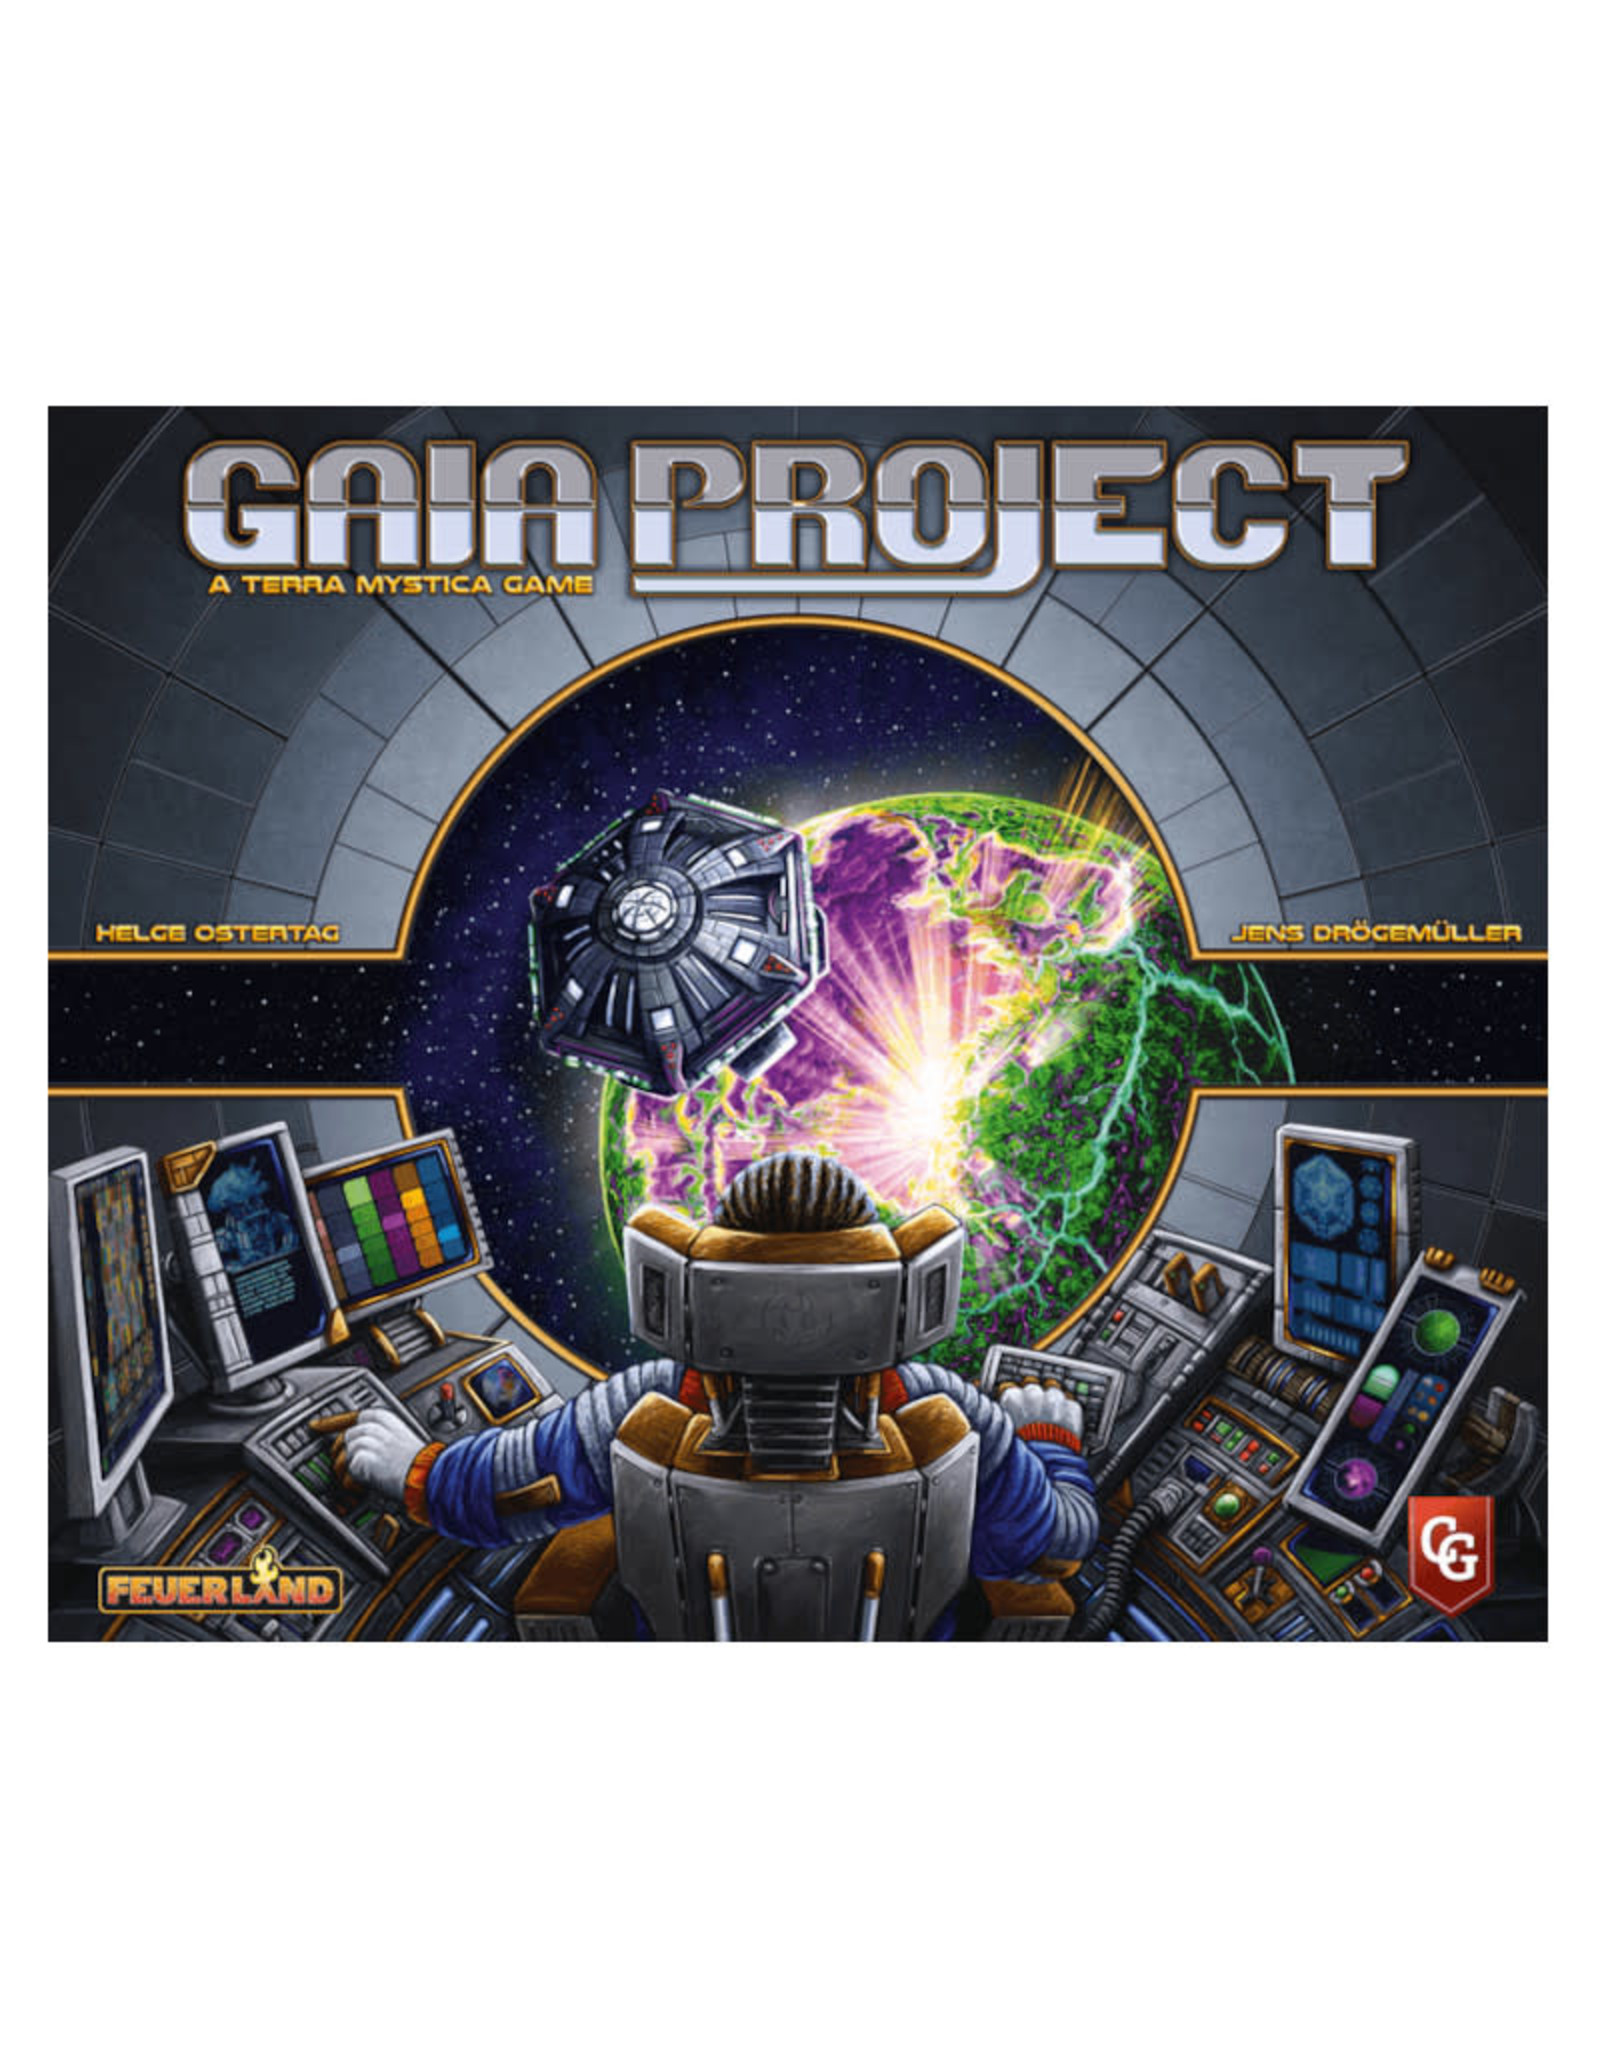 Capstone Games Gaia Project